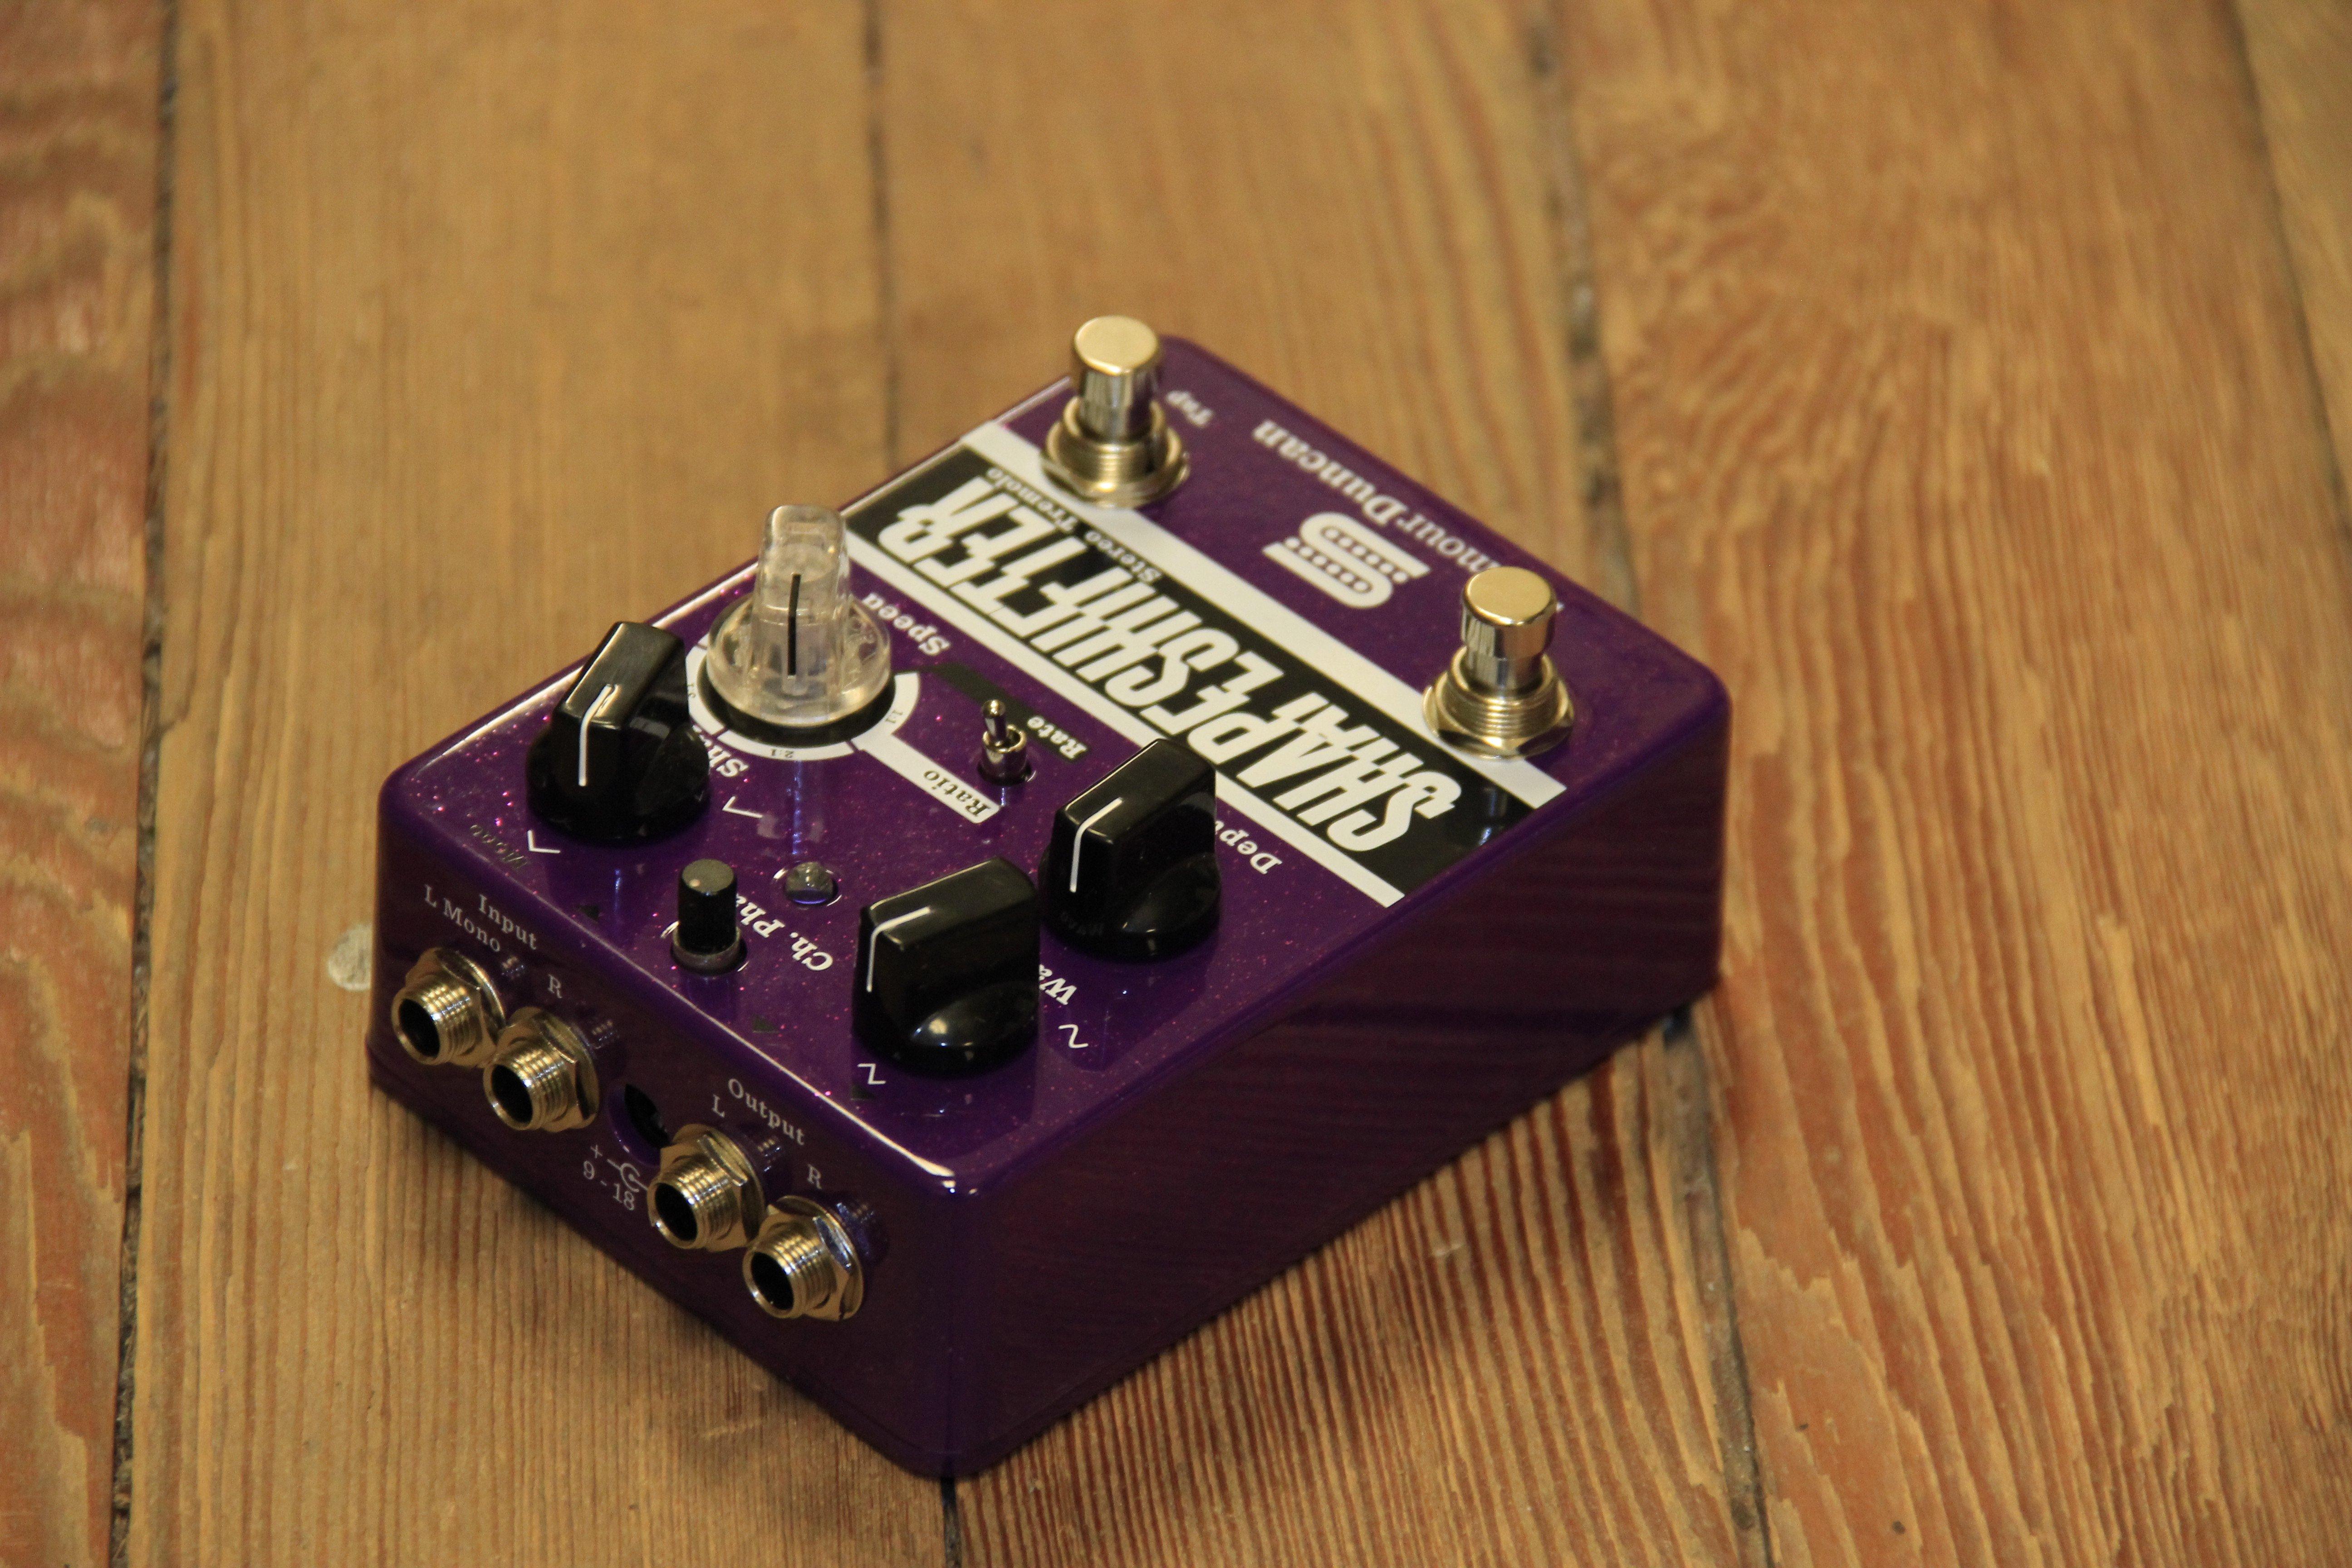 Seymour Duncan Shape Shifter Hi-def Stereo Tremolo guitar